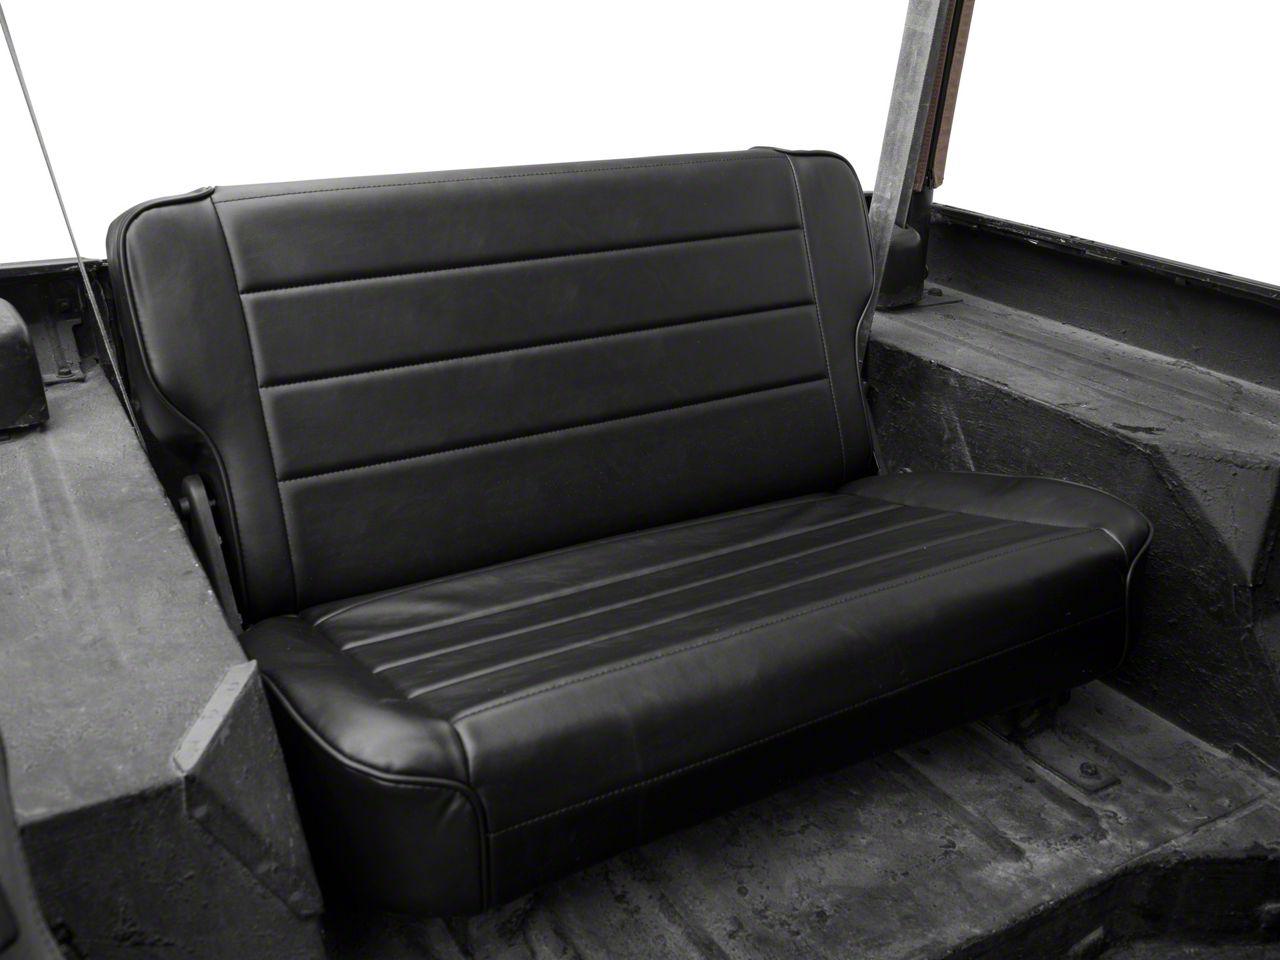 Smittybilt Rear Fold & Tumble Seat - Traditional Black (87-95 Jeep Wrangler YJ)